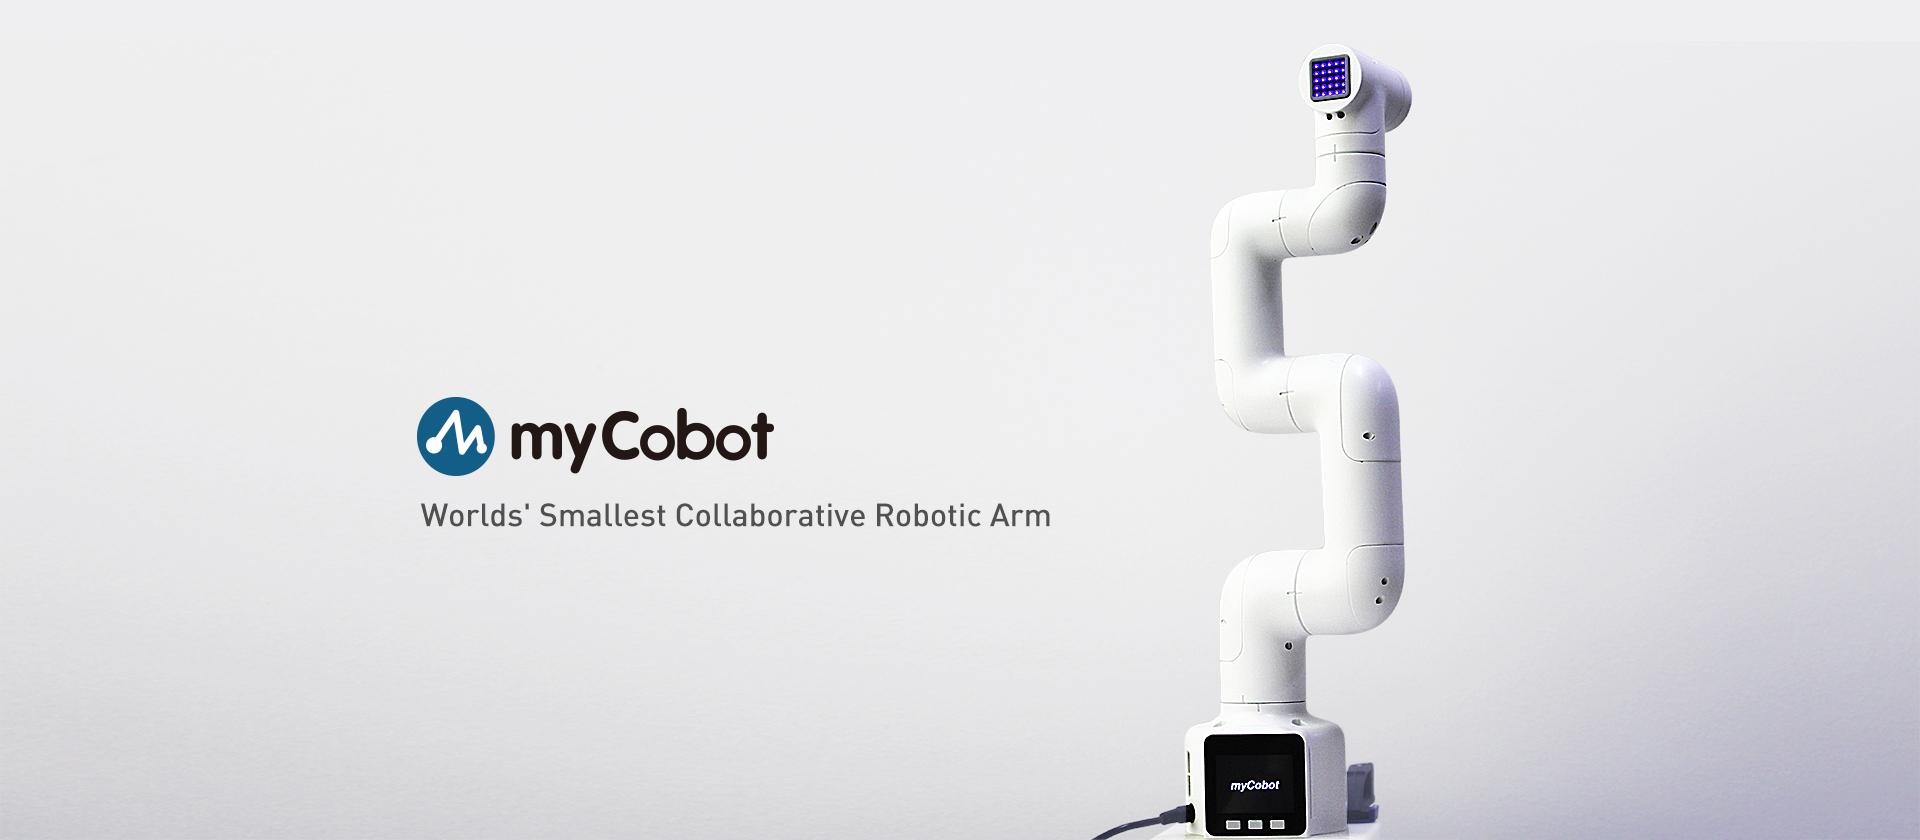 Elephant Robotics Introducing Raspberry Pi Commercial & Educational Robot Arm